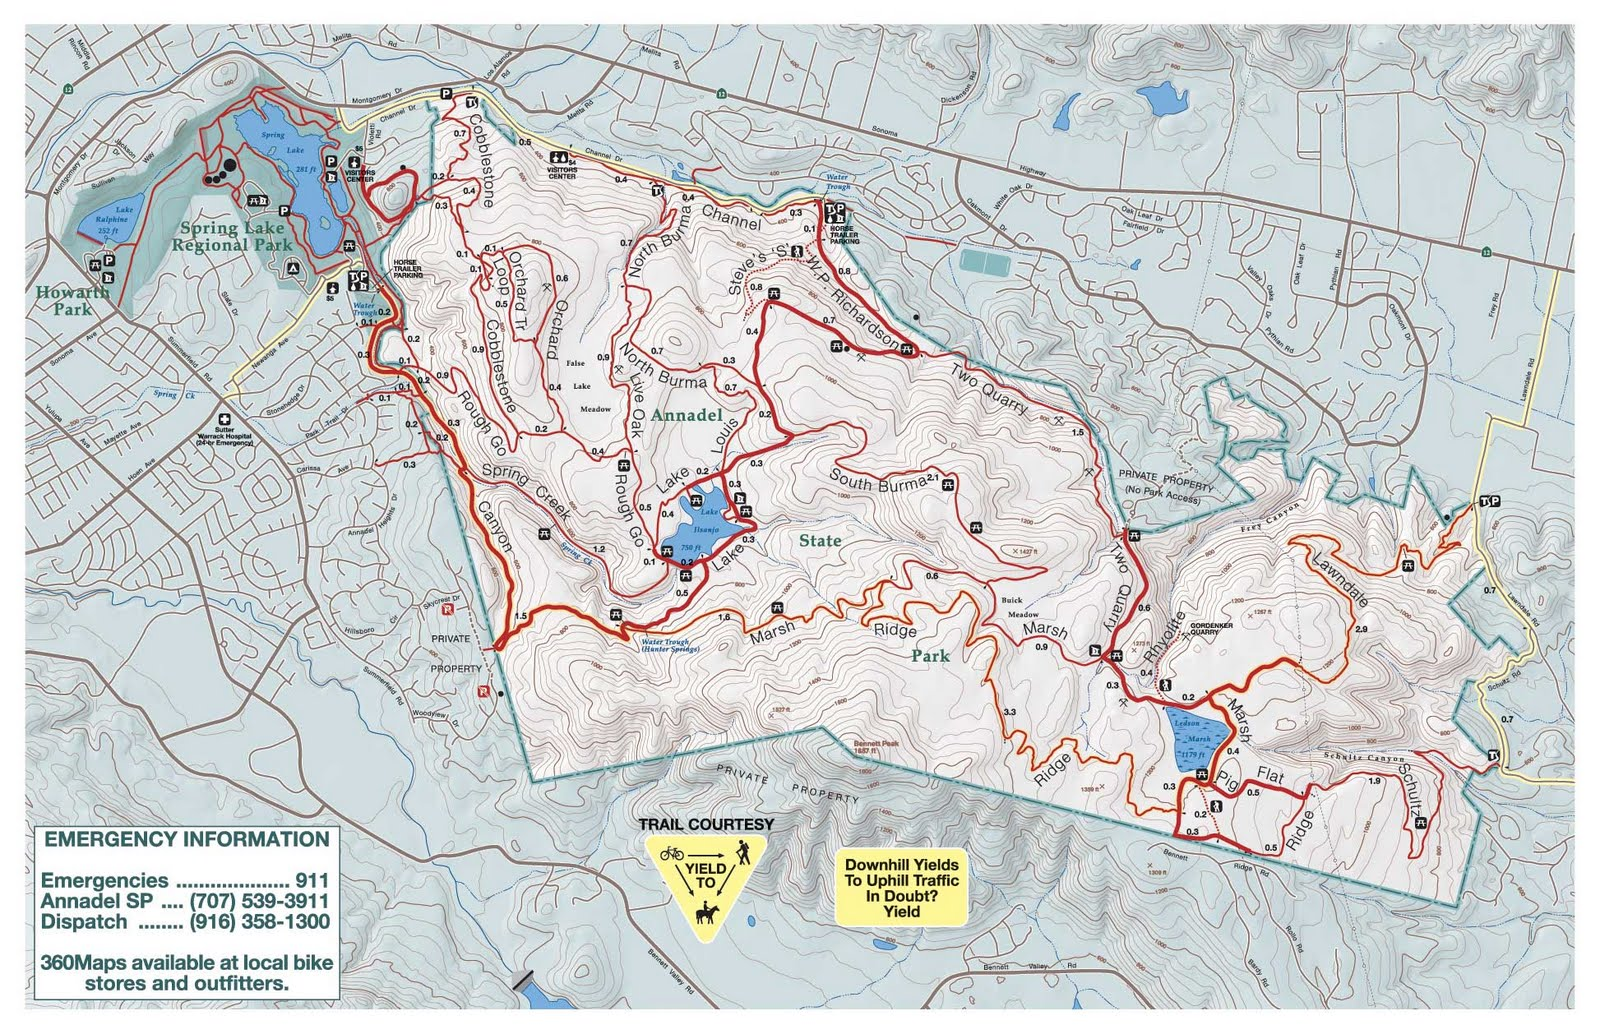 Sonoma Academy XC Fall 2014: Maps